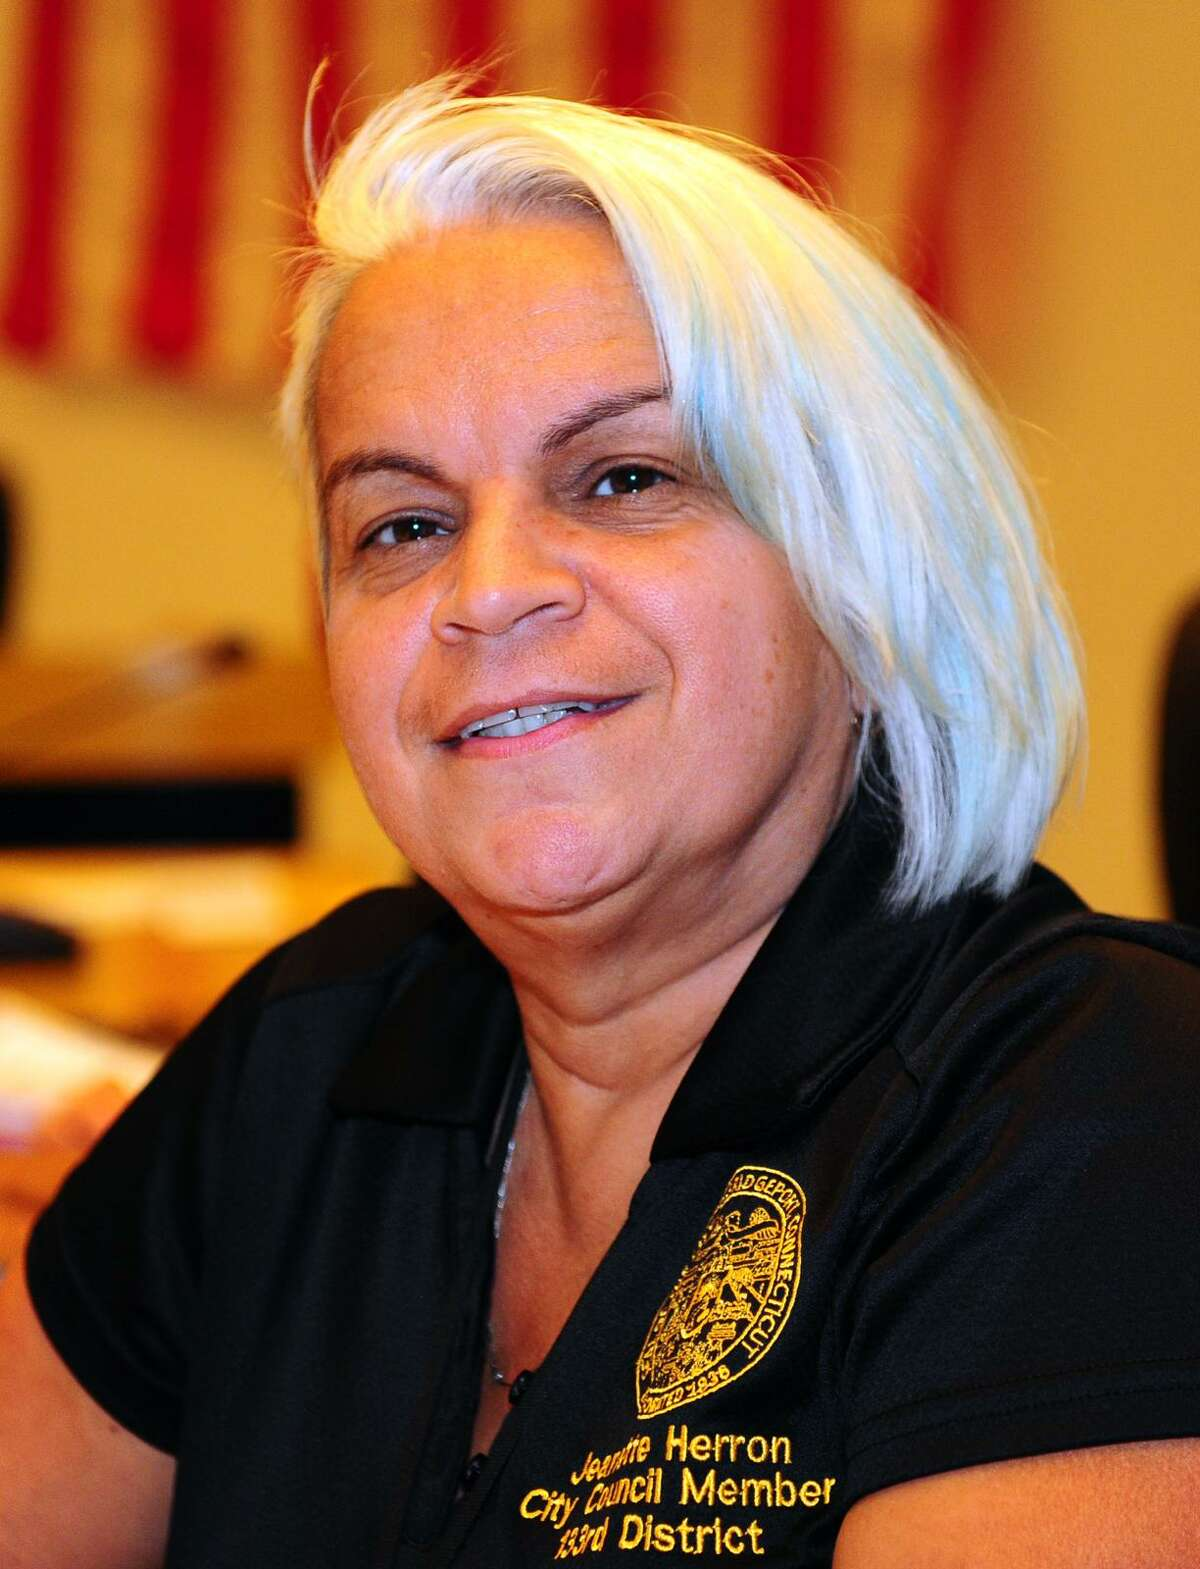 Bridgeport City Council Member Jeanette Herron at City Hall in Bridgeport, Conn., on Tuesday Sept. 6, 2016.